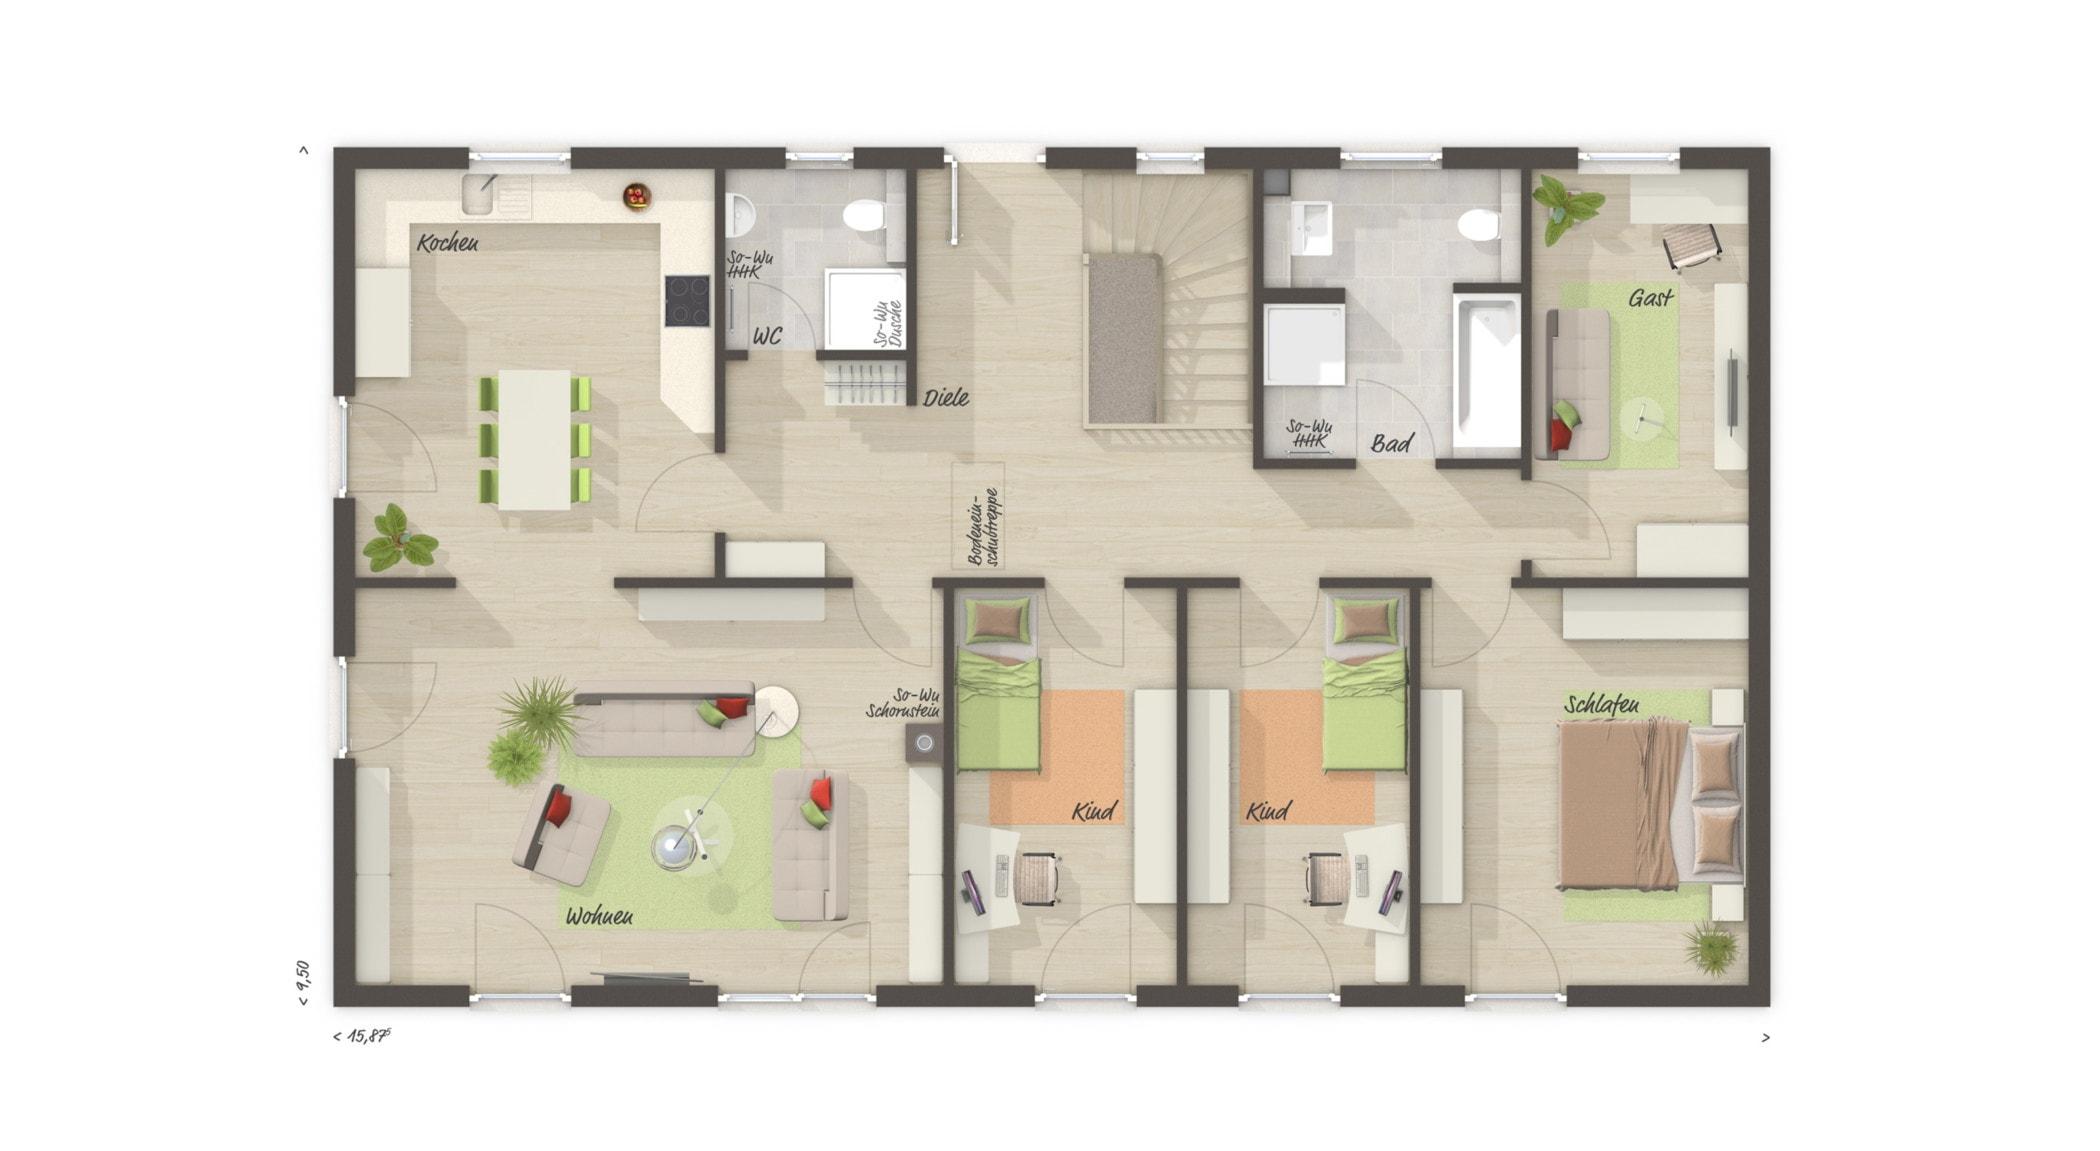 Grundriss Bungalow rechteckig mit Keller, 5 Zimmer, 130 qm - Massivhaus bauen Ideen Town Country Haus Bungalow 131 - HausbauDirekt.de